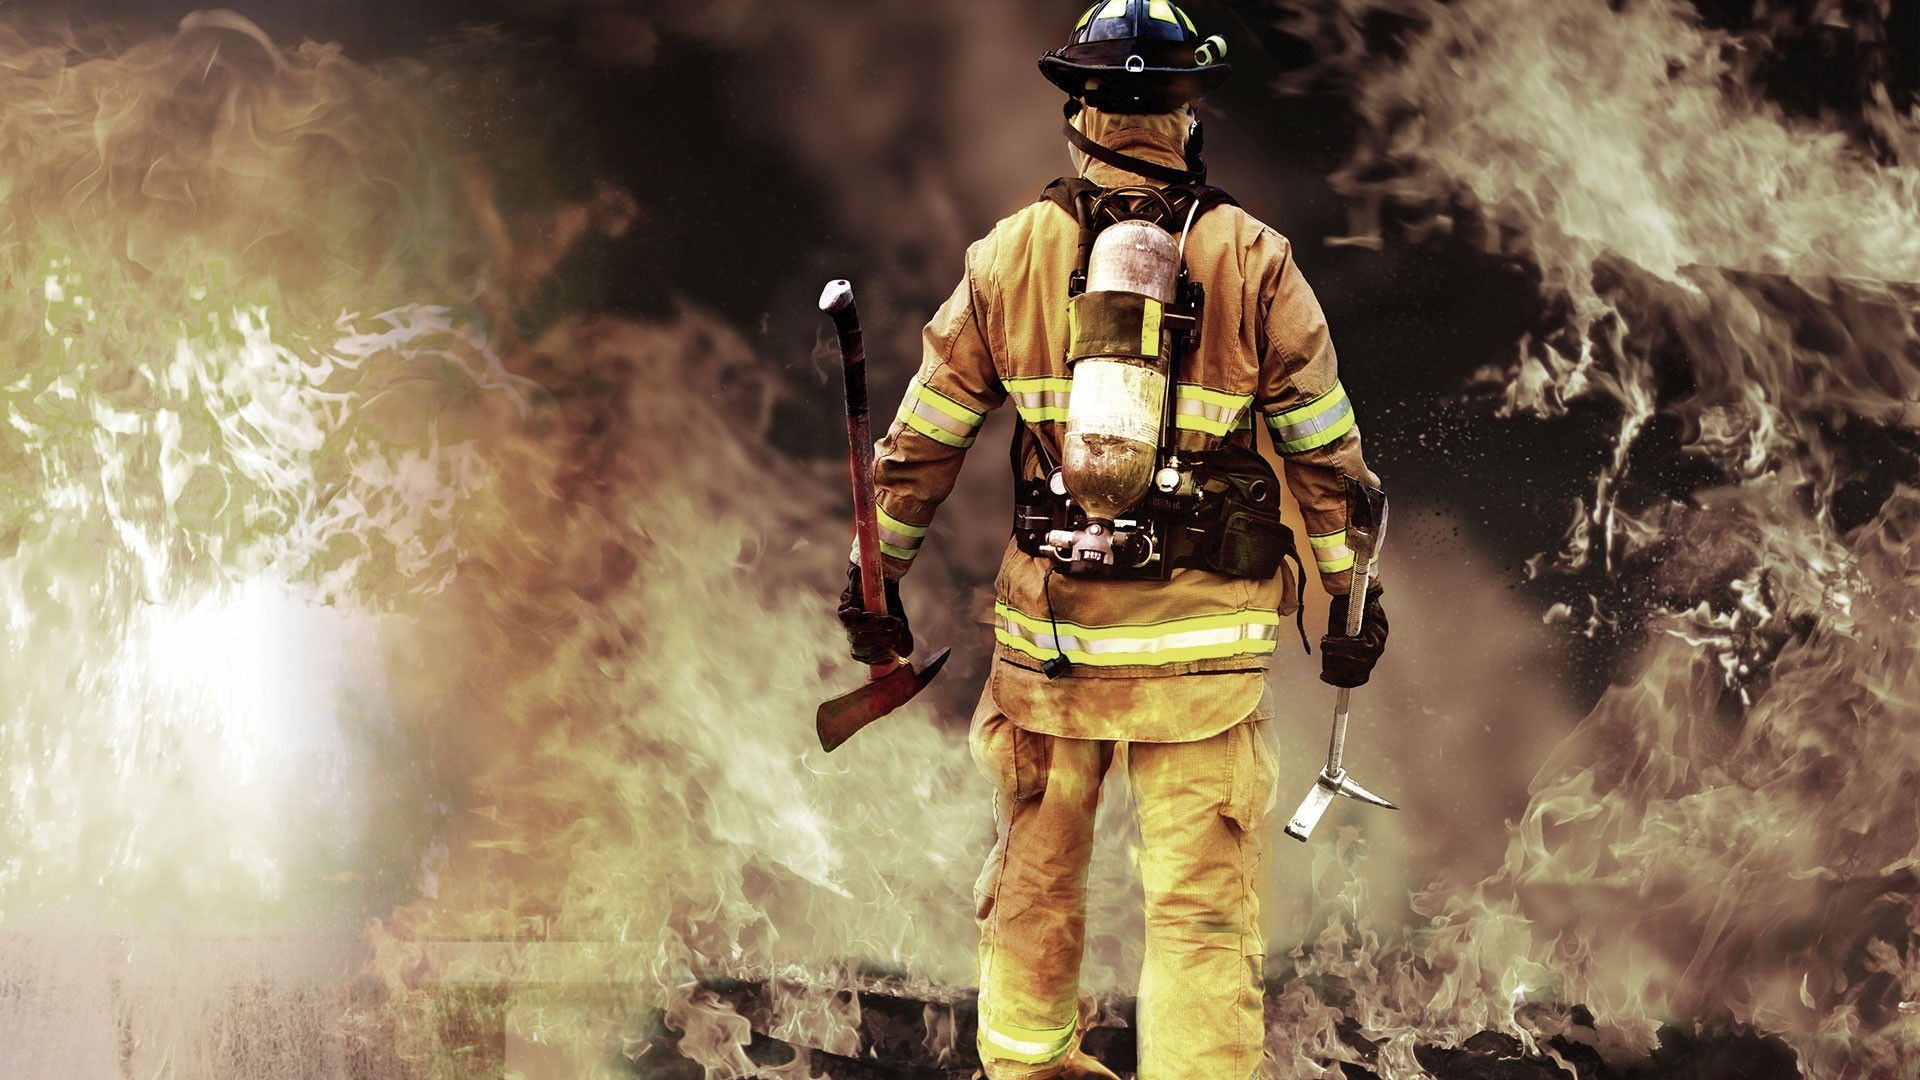 Firefighter Wallpaper image hd